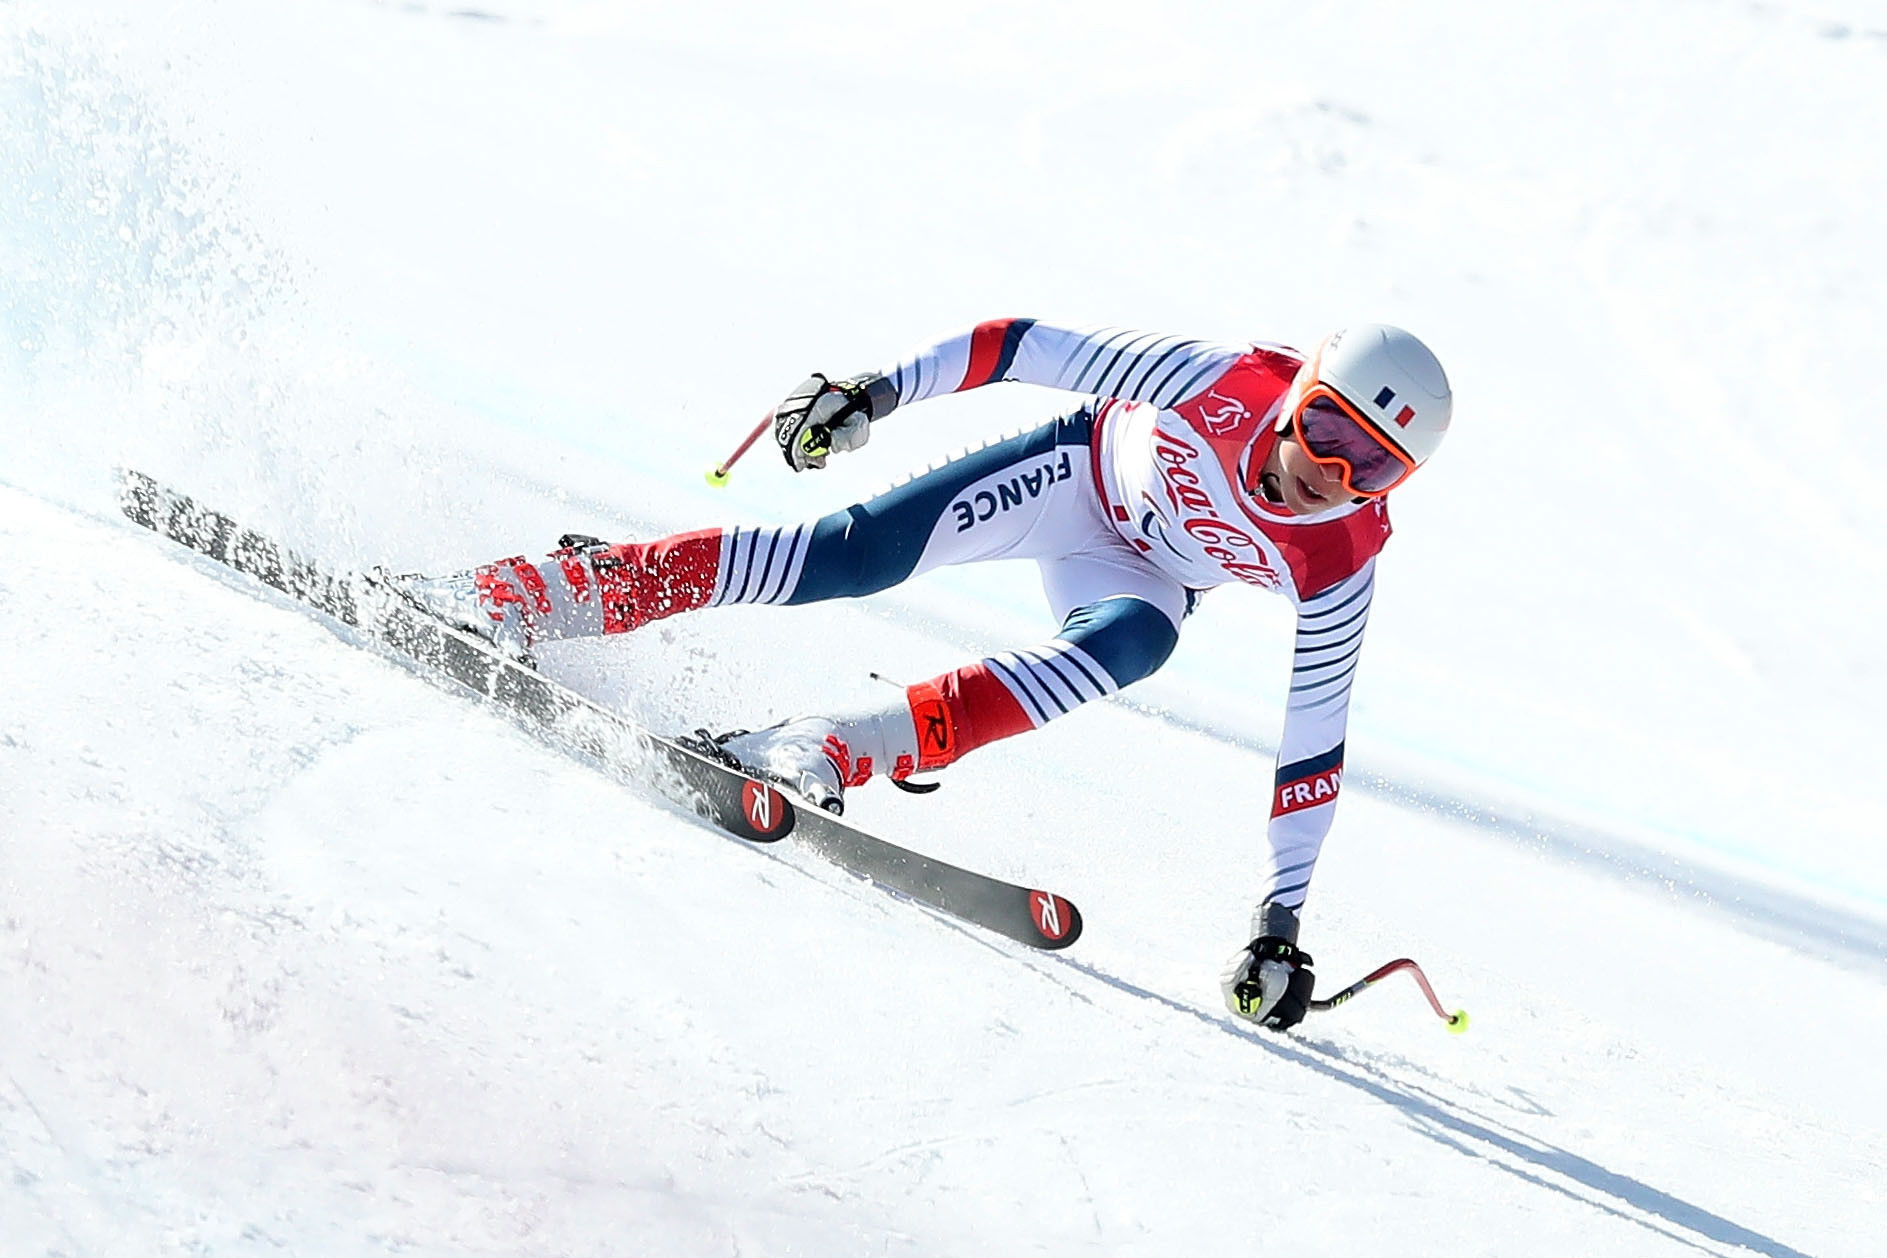 Bauchet turns tables on Bugaev at World Para Alpine Skiing World Cup